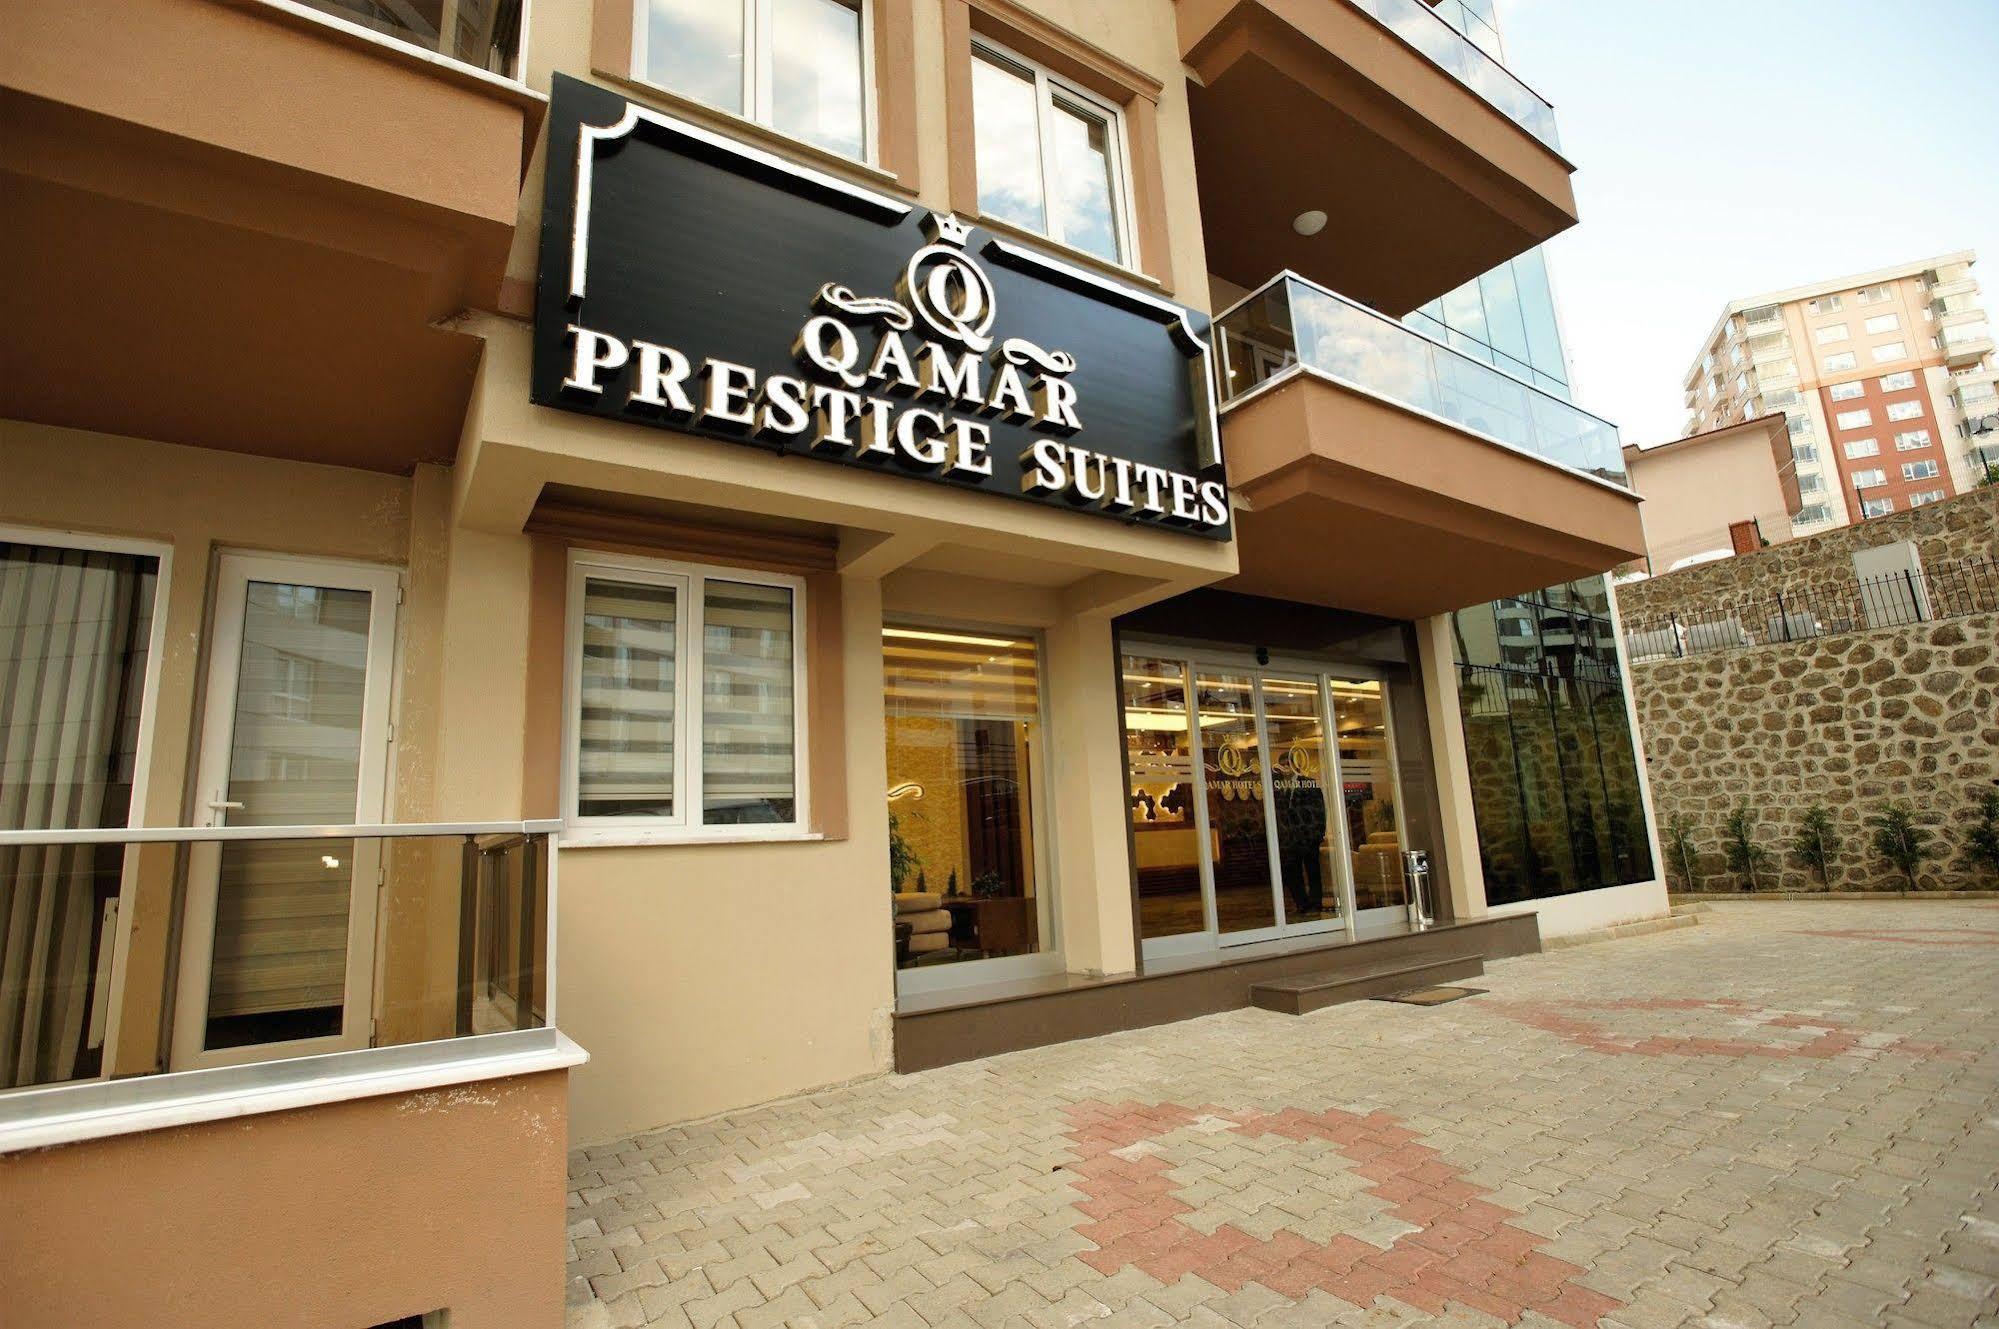 Qamar Prestige Suites